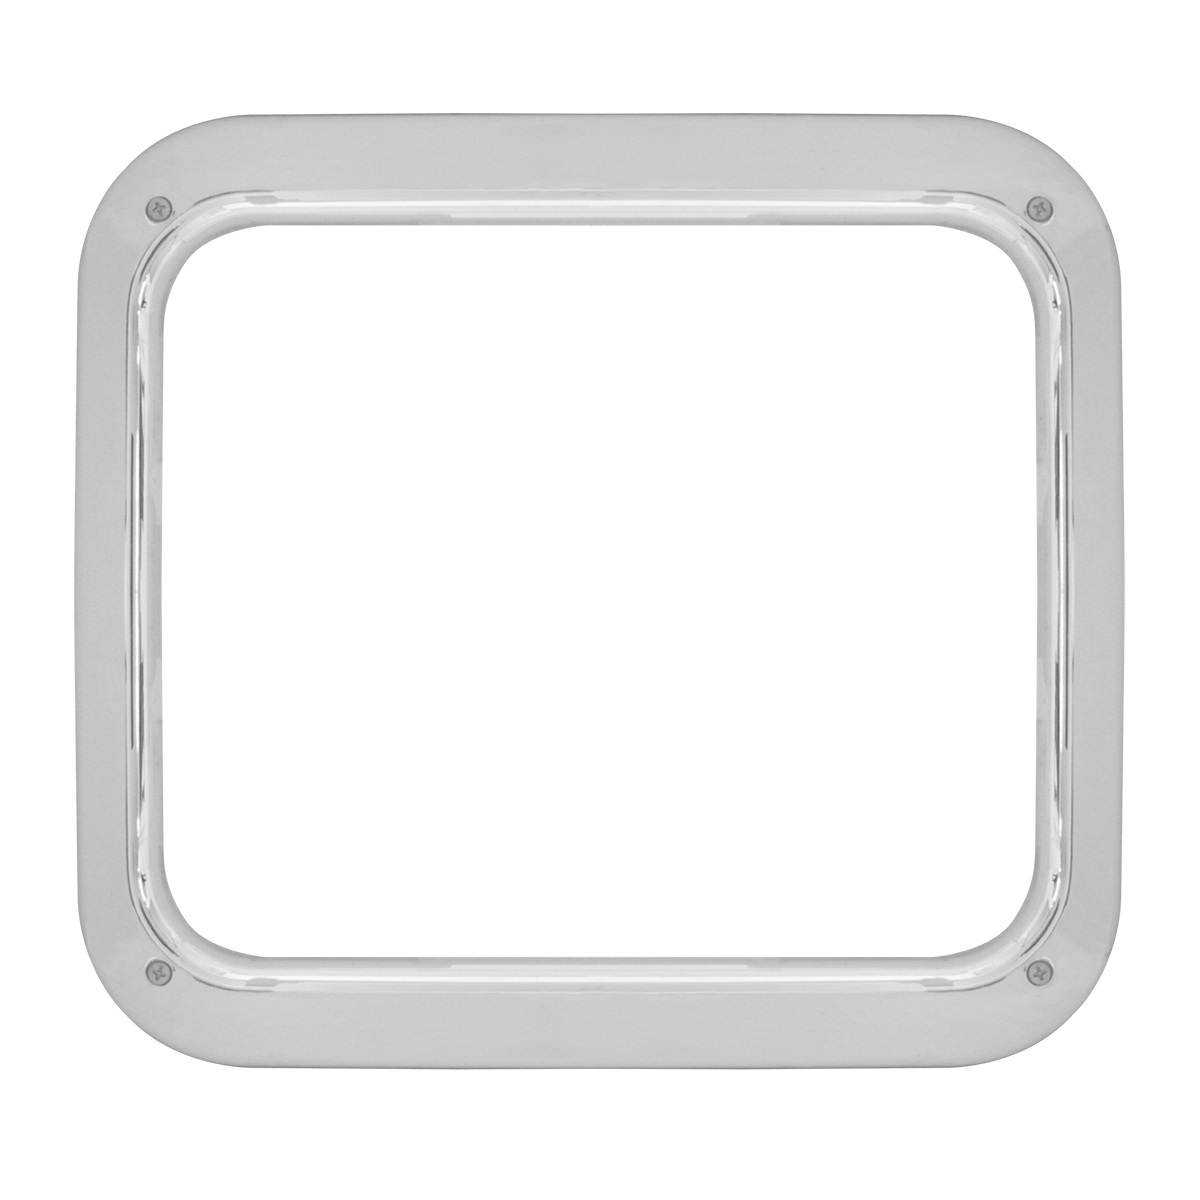 97554 Inside Daylight Cab Door Window Trim for Kenworth W900's